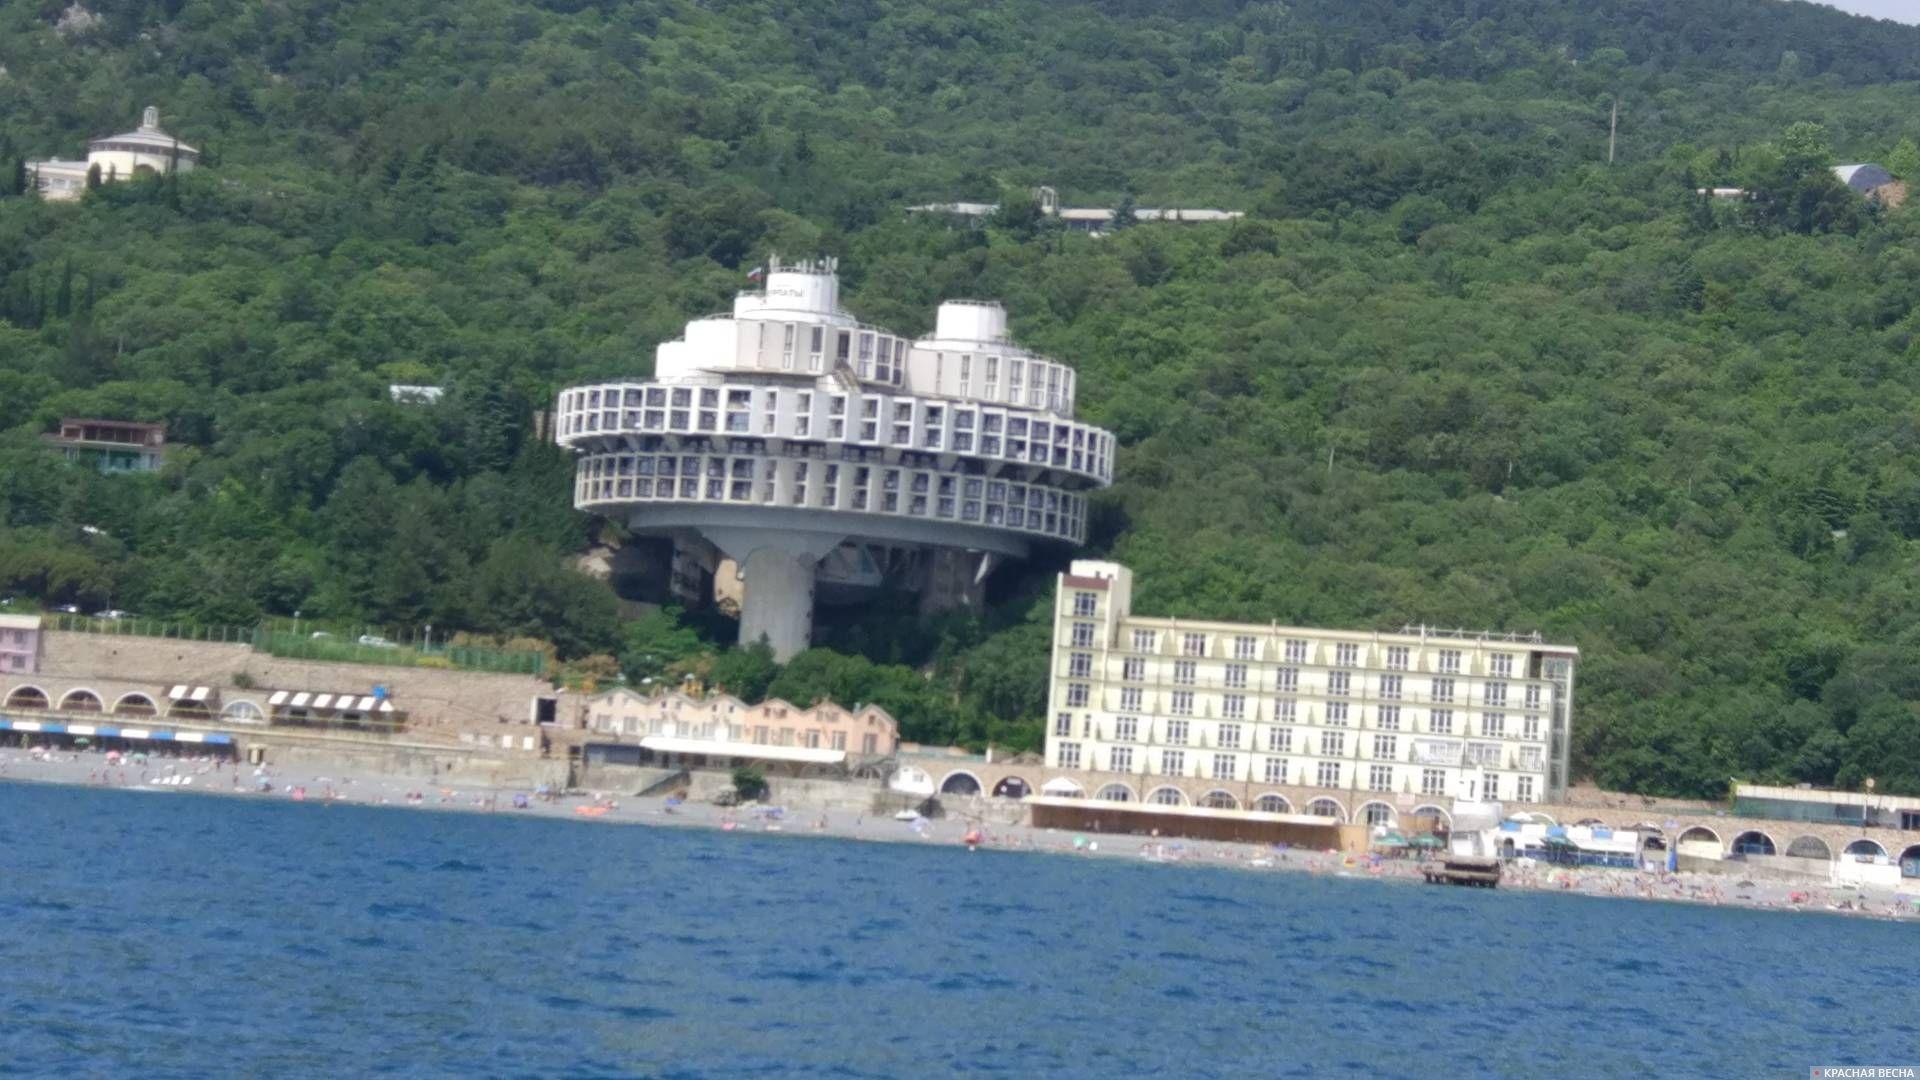 Гостиница Летающая тарелка. Крым